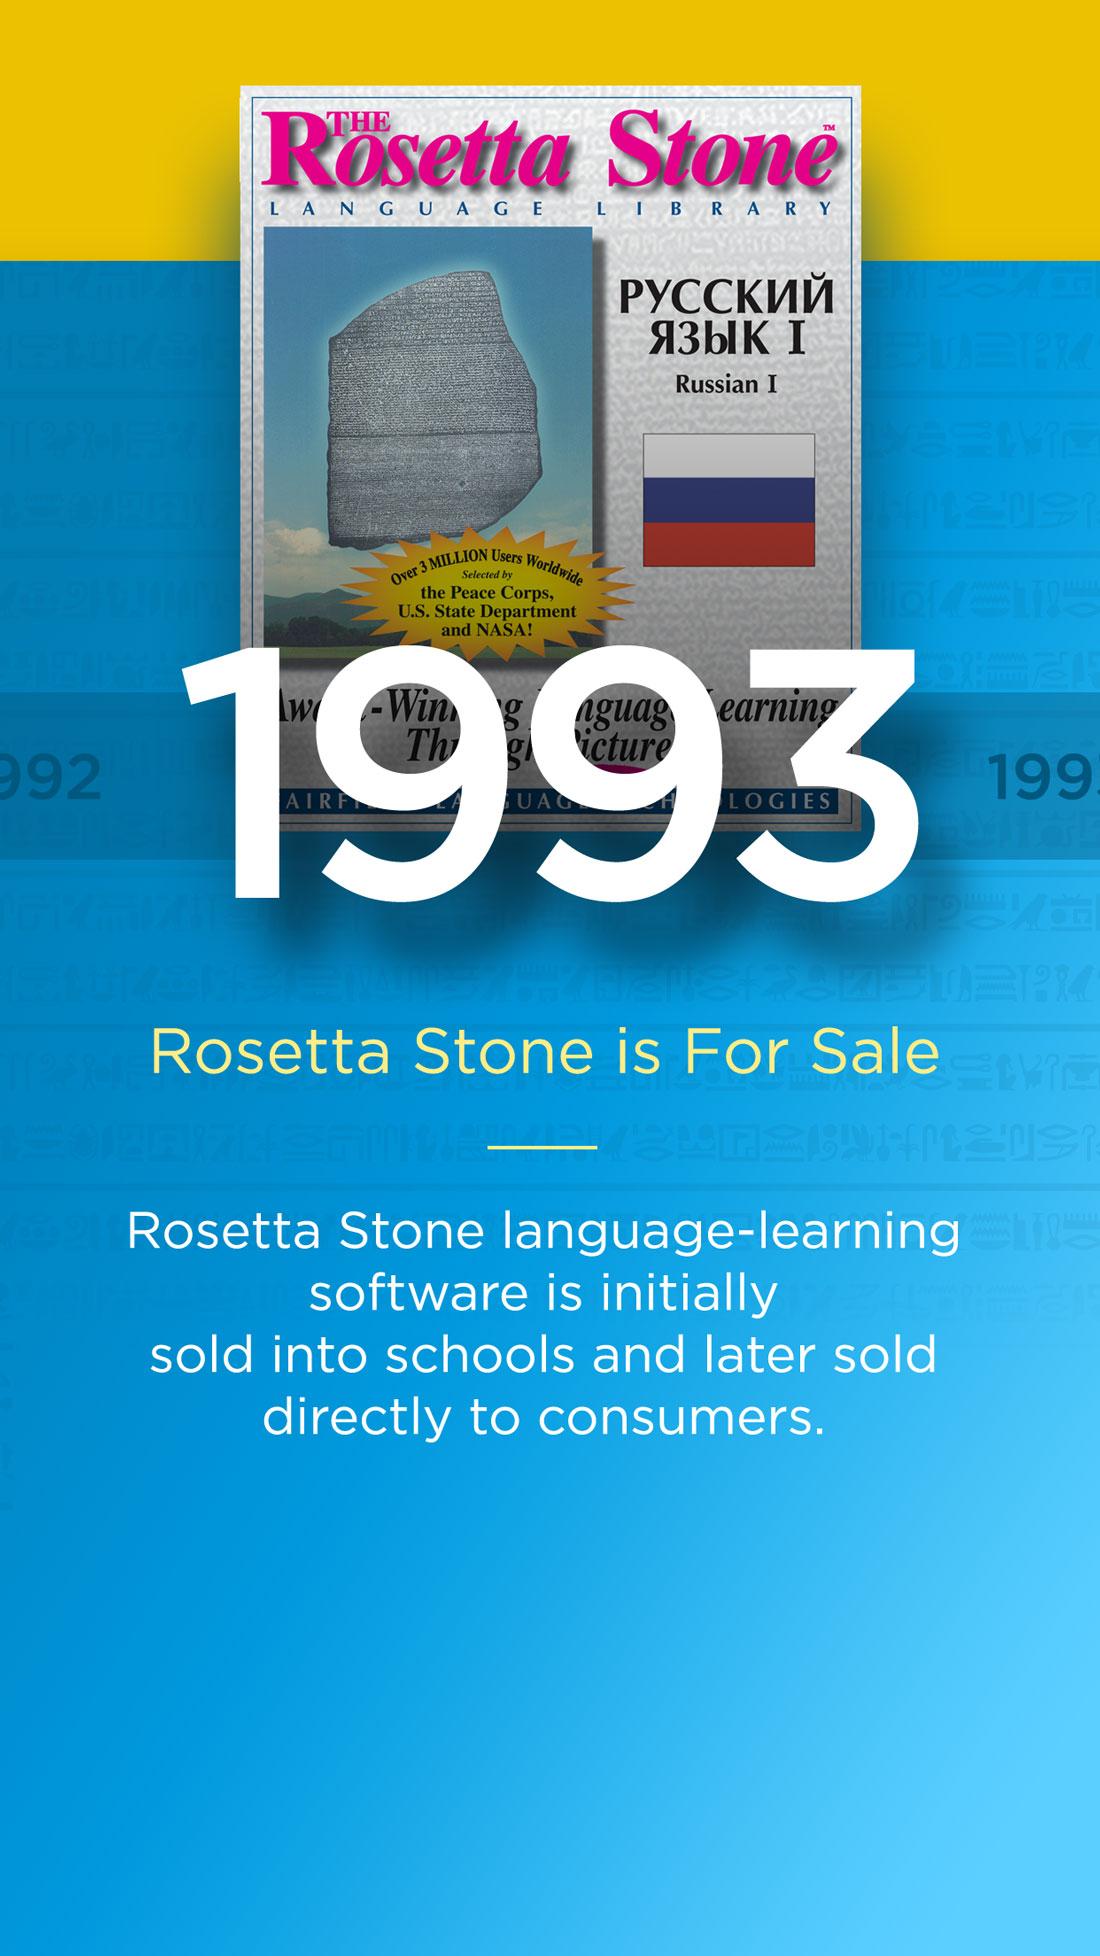 About Rosetta Stone